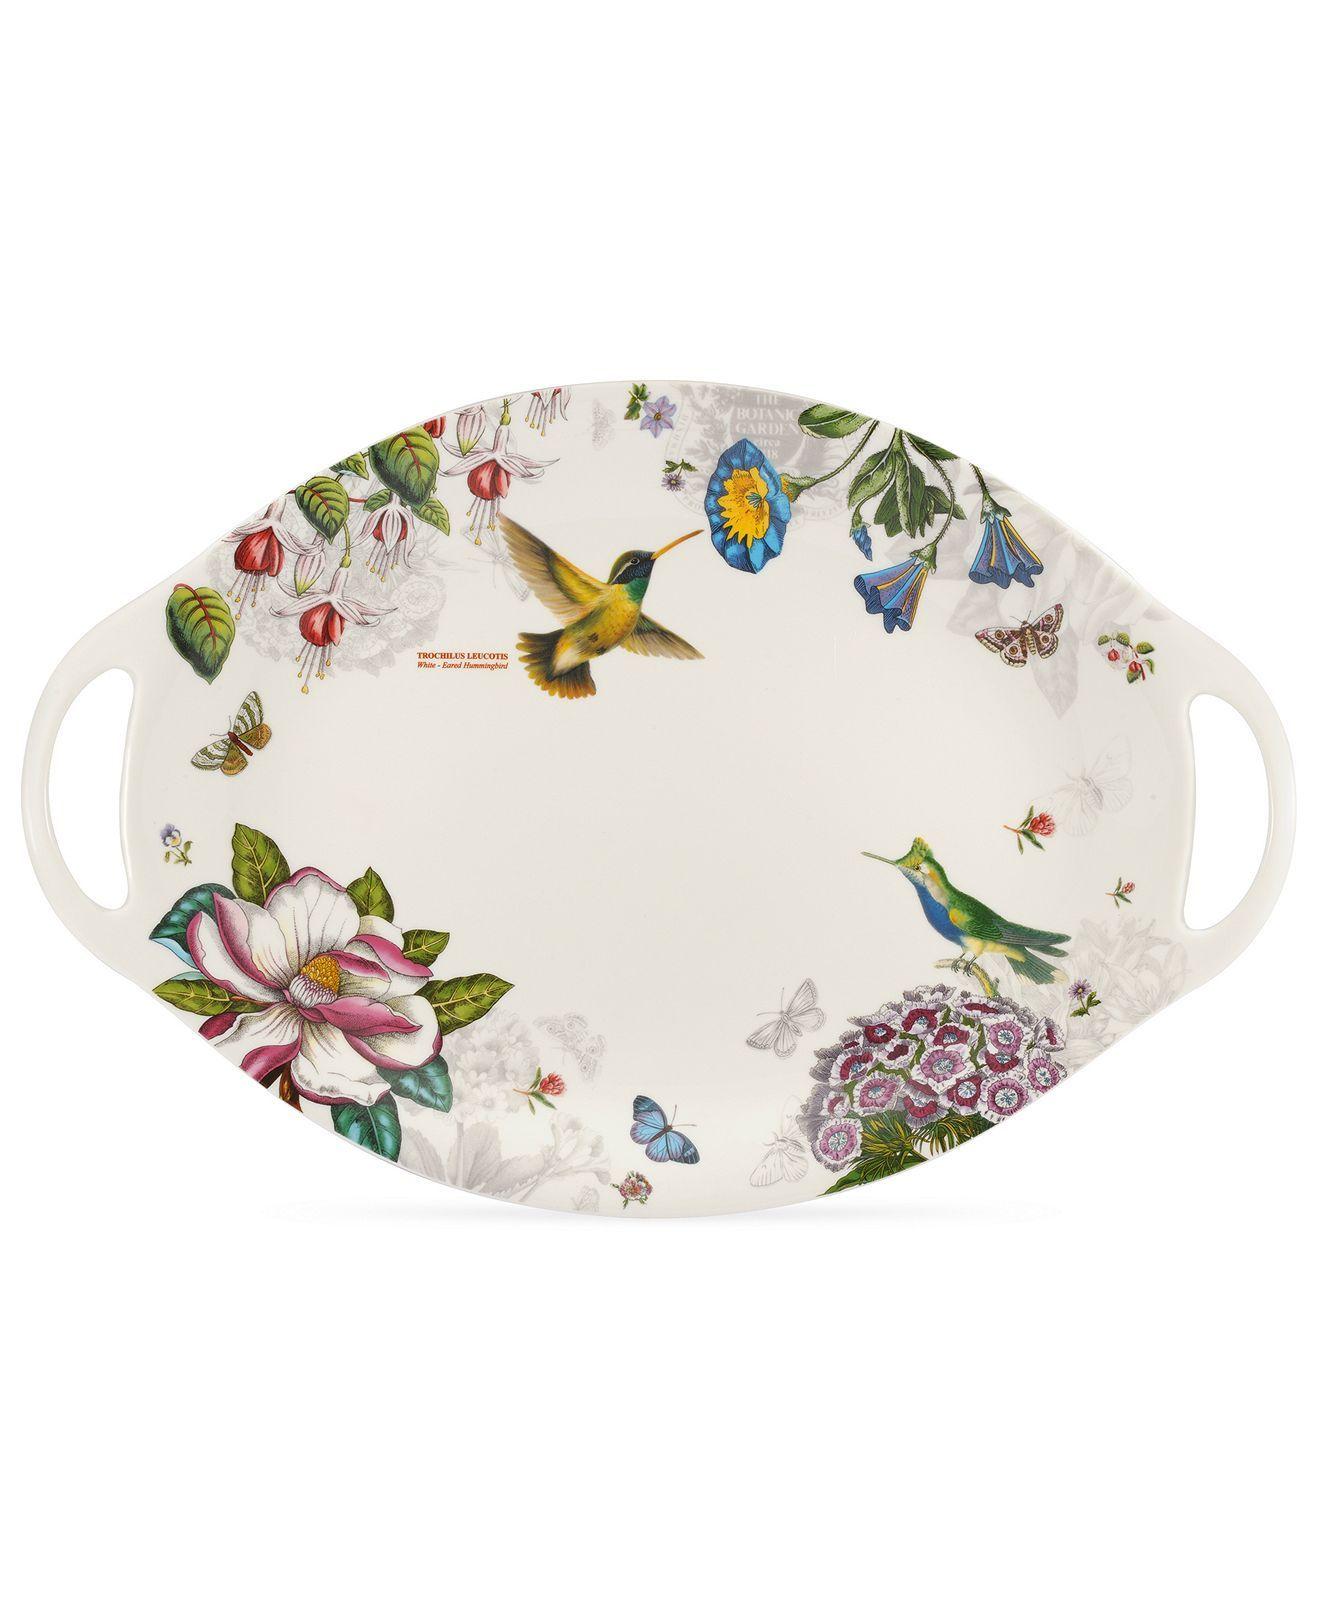 Portmeirion Dinnerware Botanic Hummingbird Platter Serveware